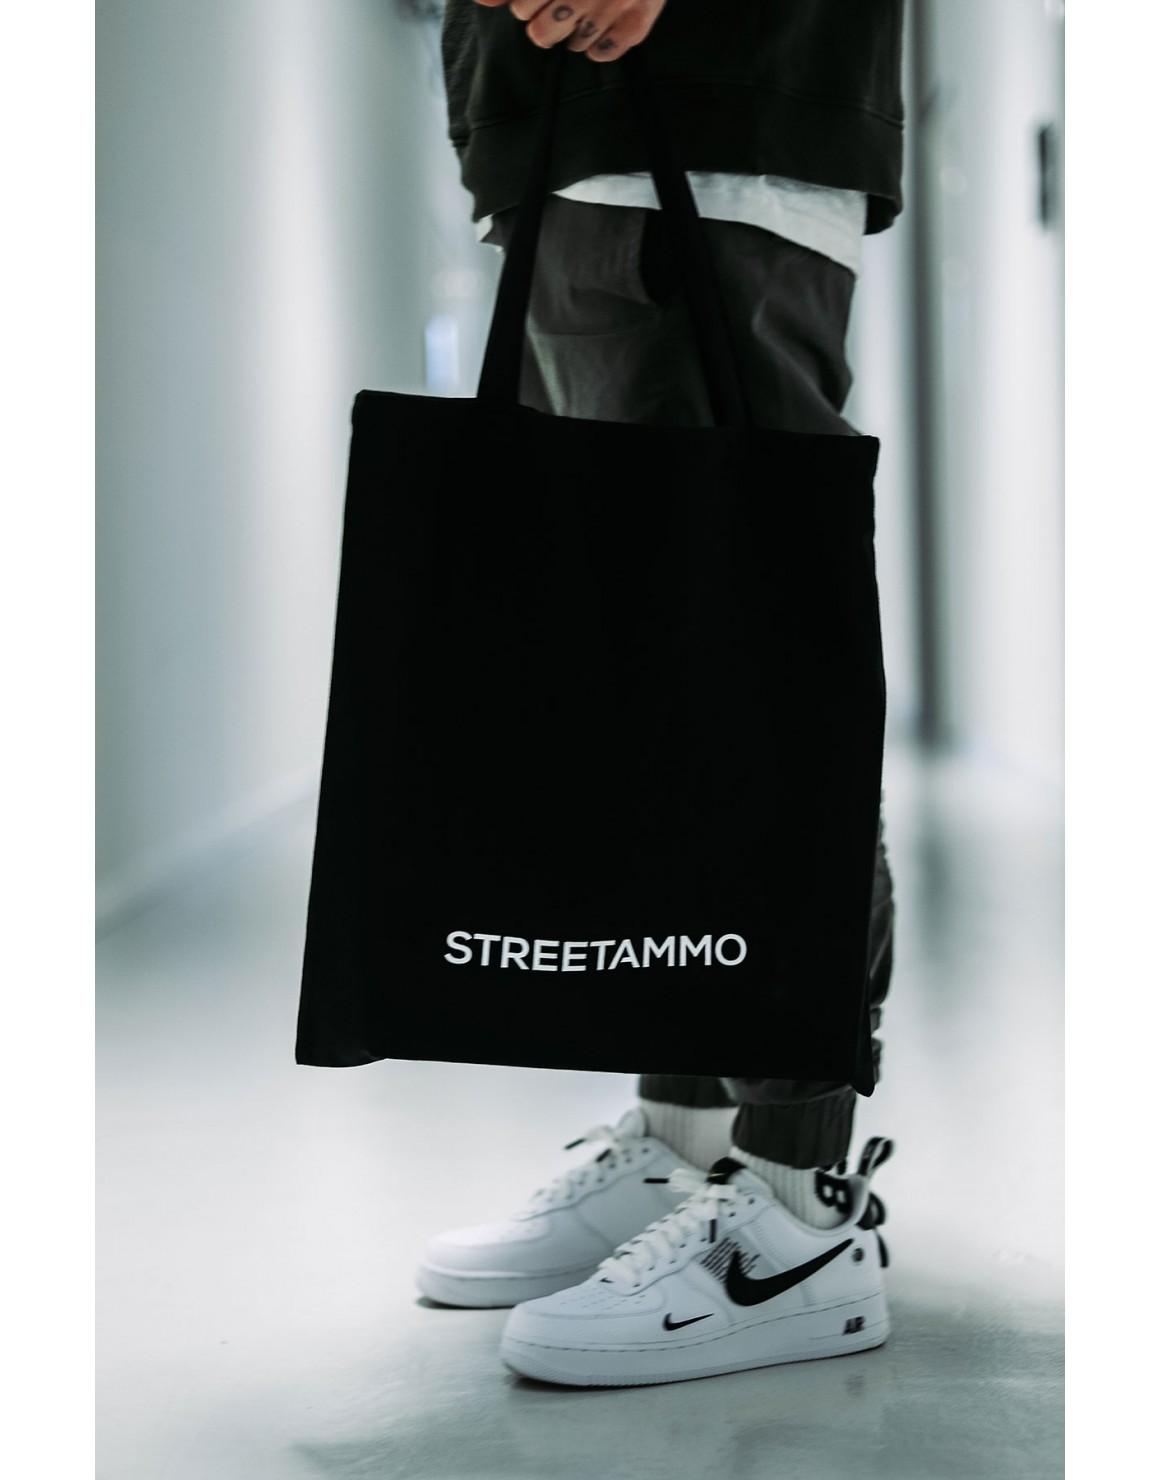 Streetammo Tote bag